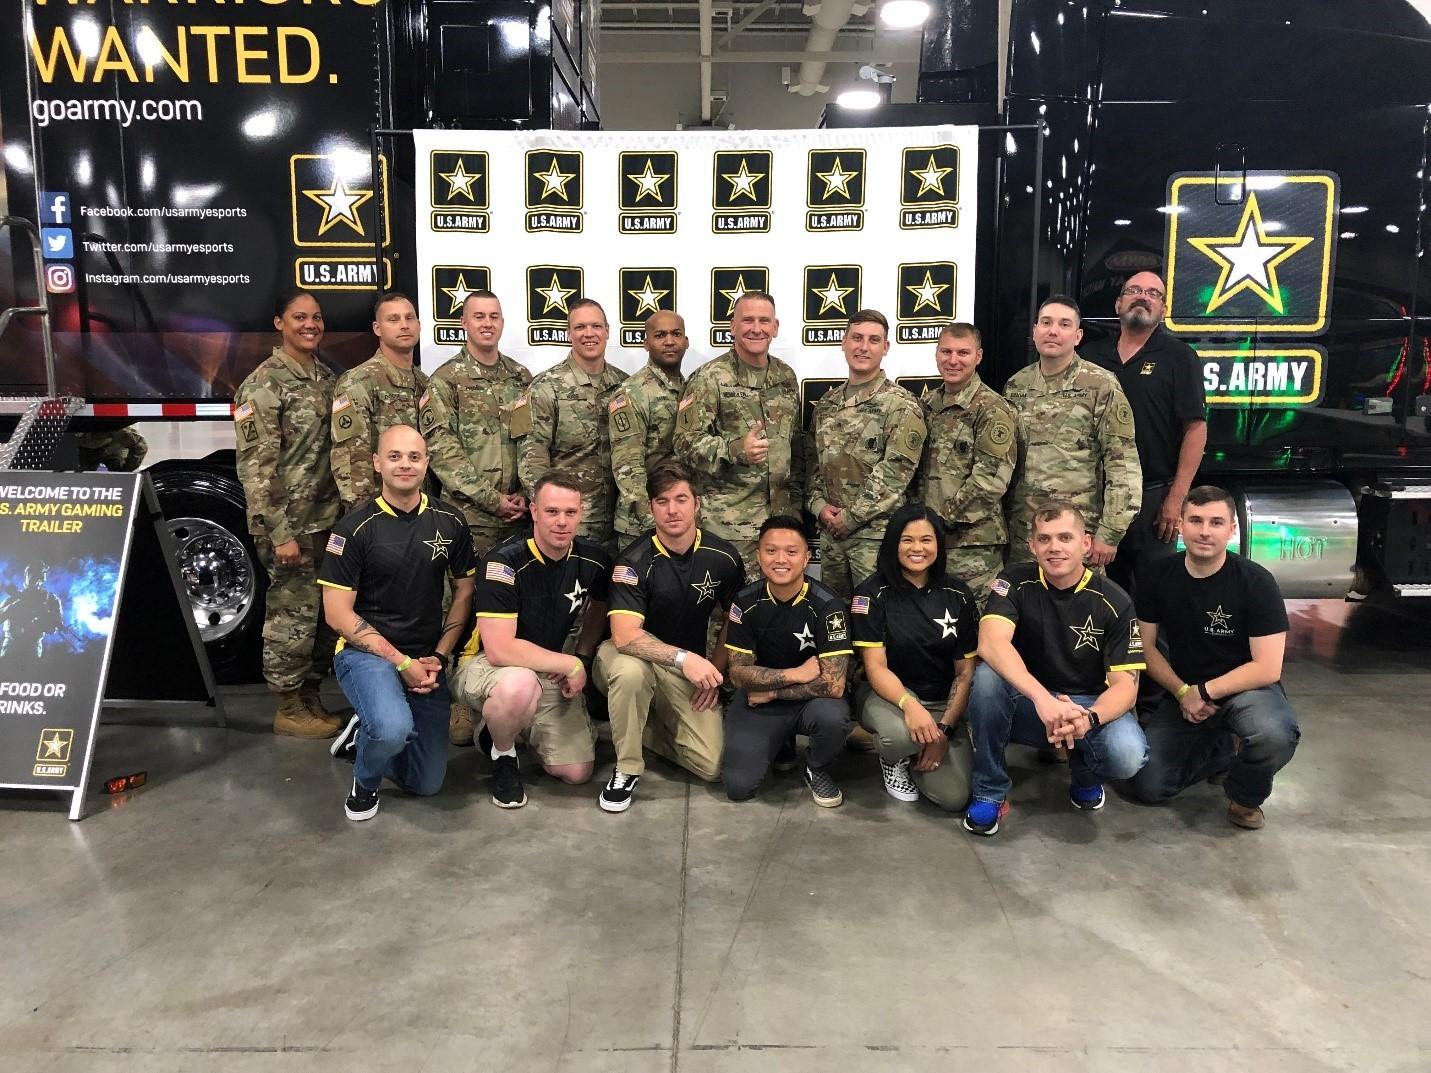 Army首次展示其最新的Esports游戏预告片| 文章 的...